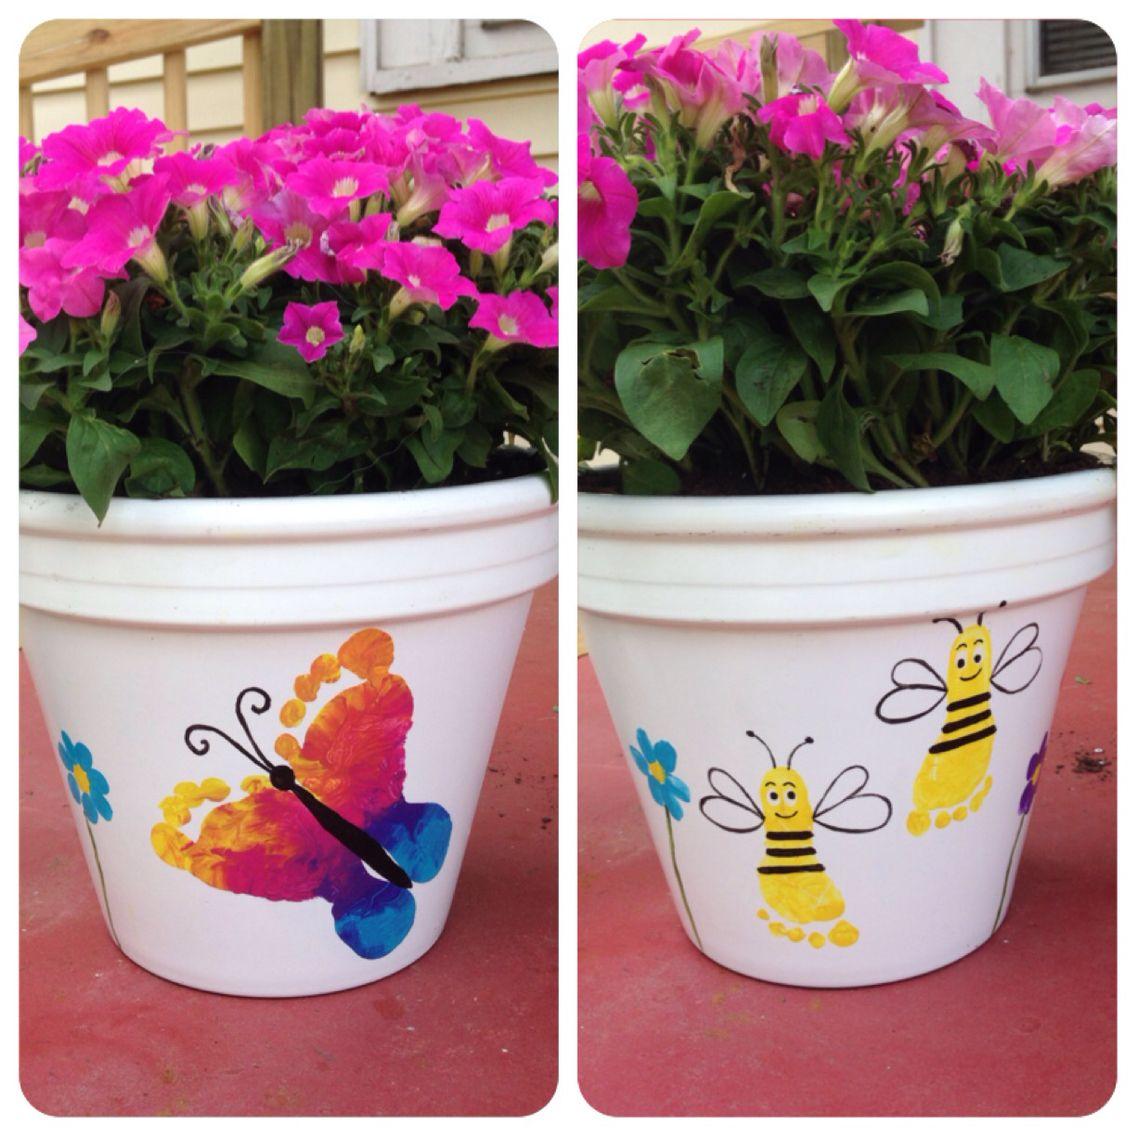 Footprint Motheru0027s Day Flower Pot! Pictures Gallery